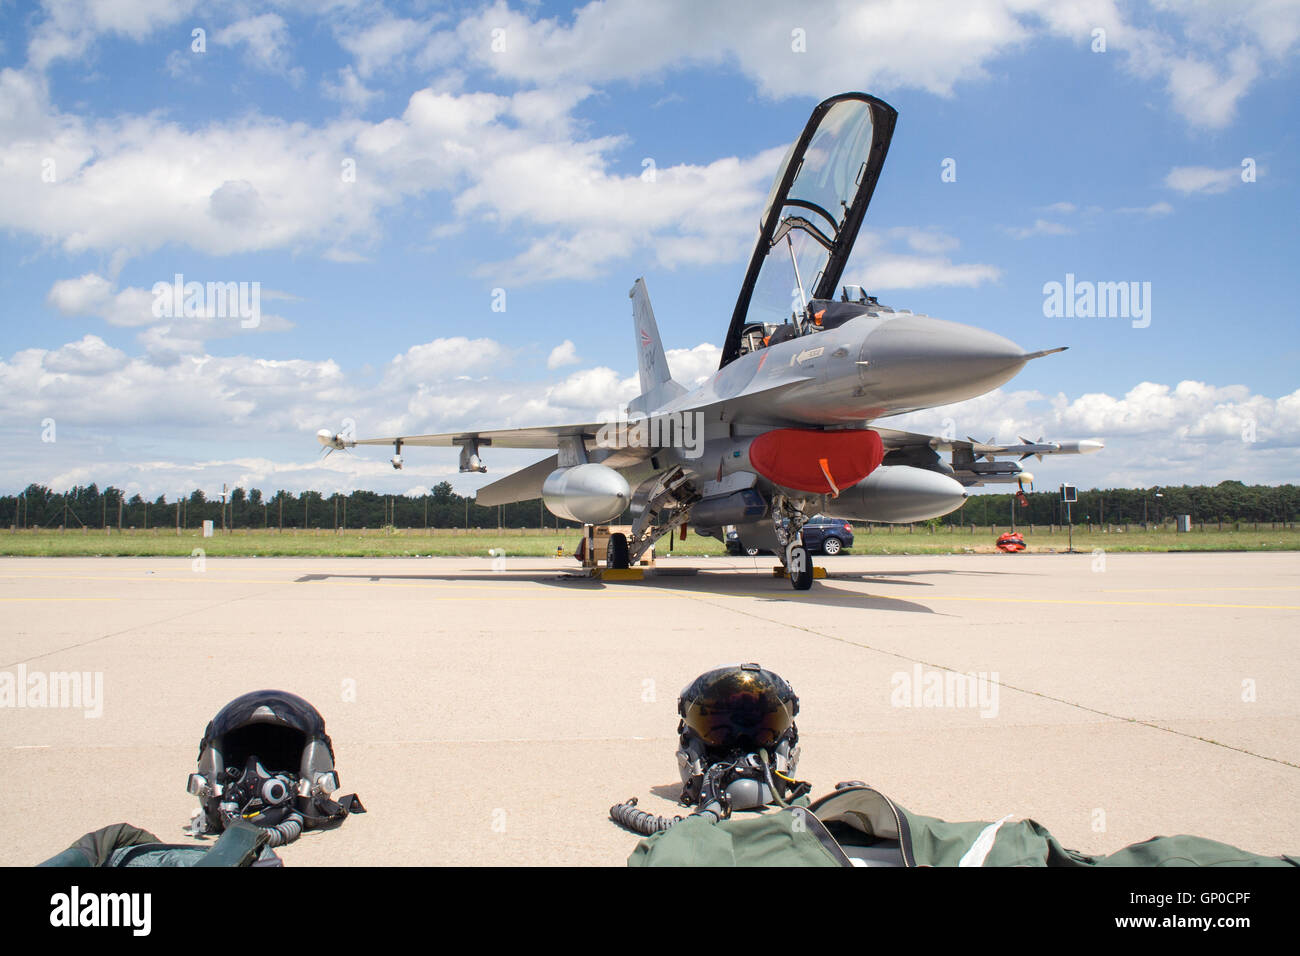 Jet Fighter Pilot Helmet Stock Photos & Jet Fighter Pilot